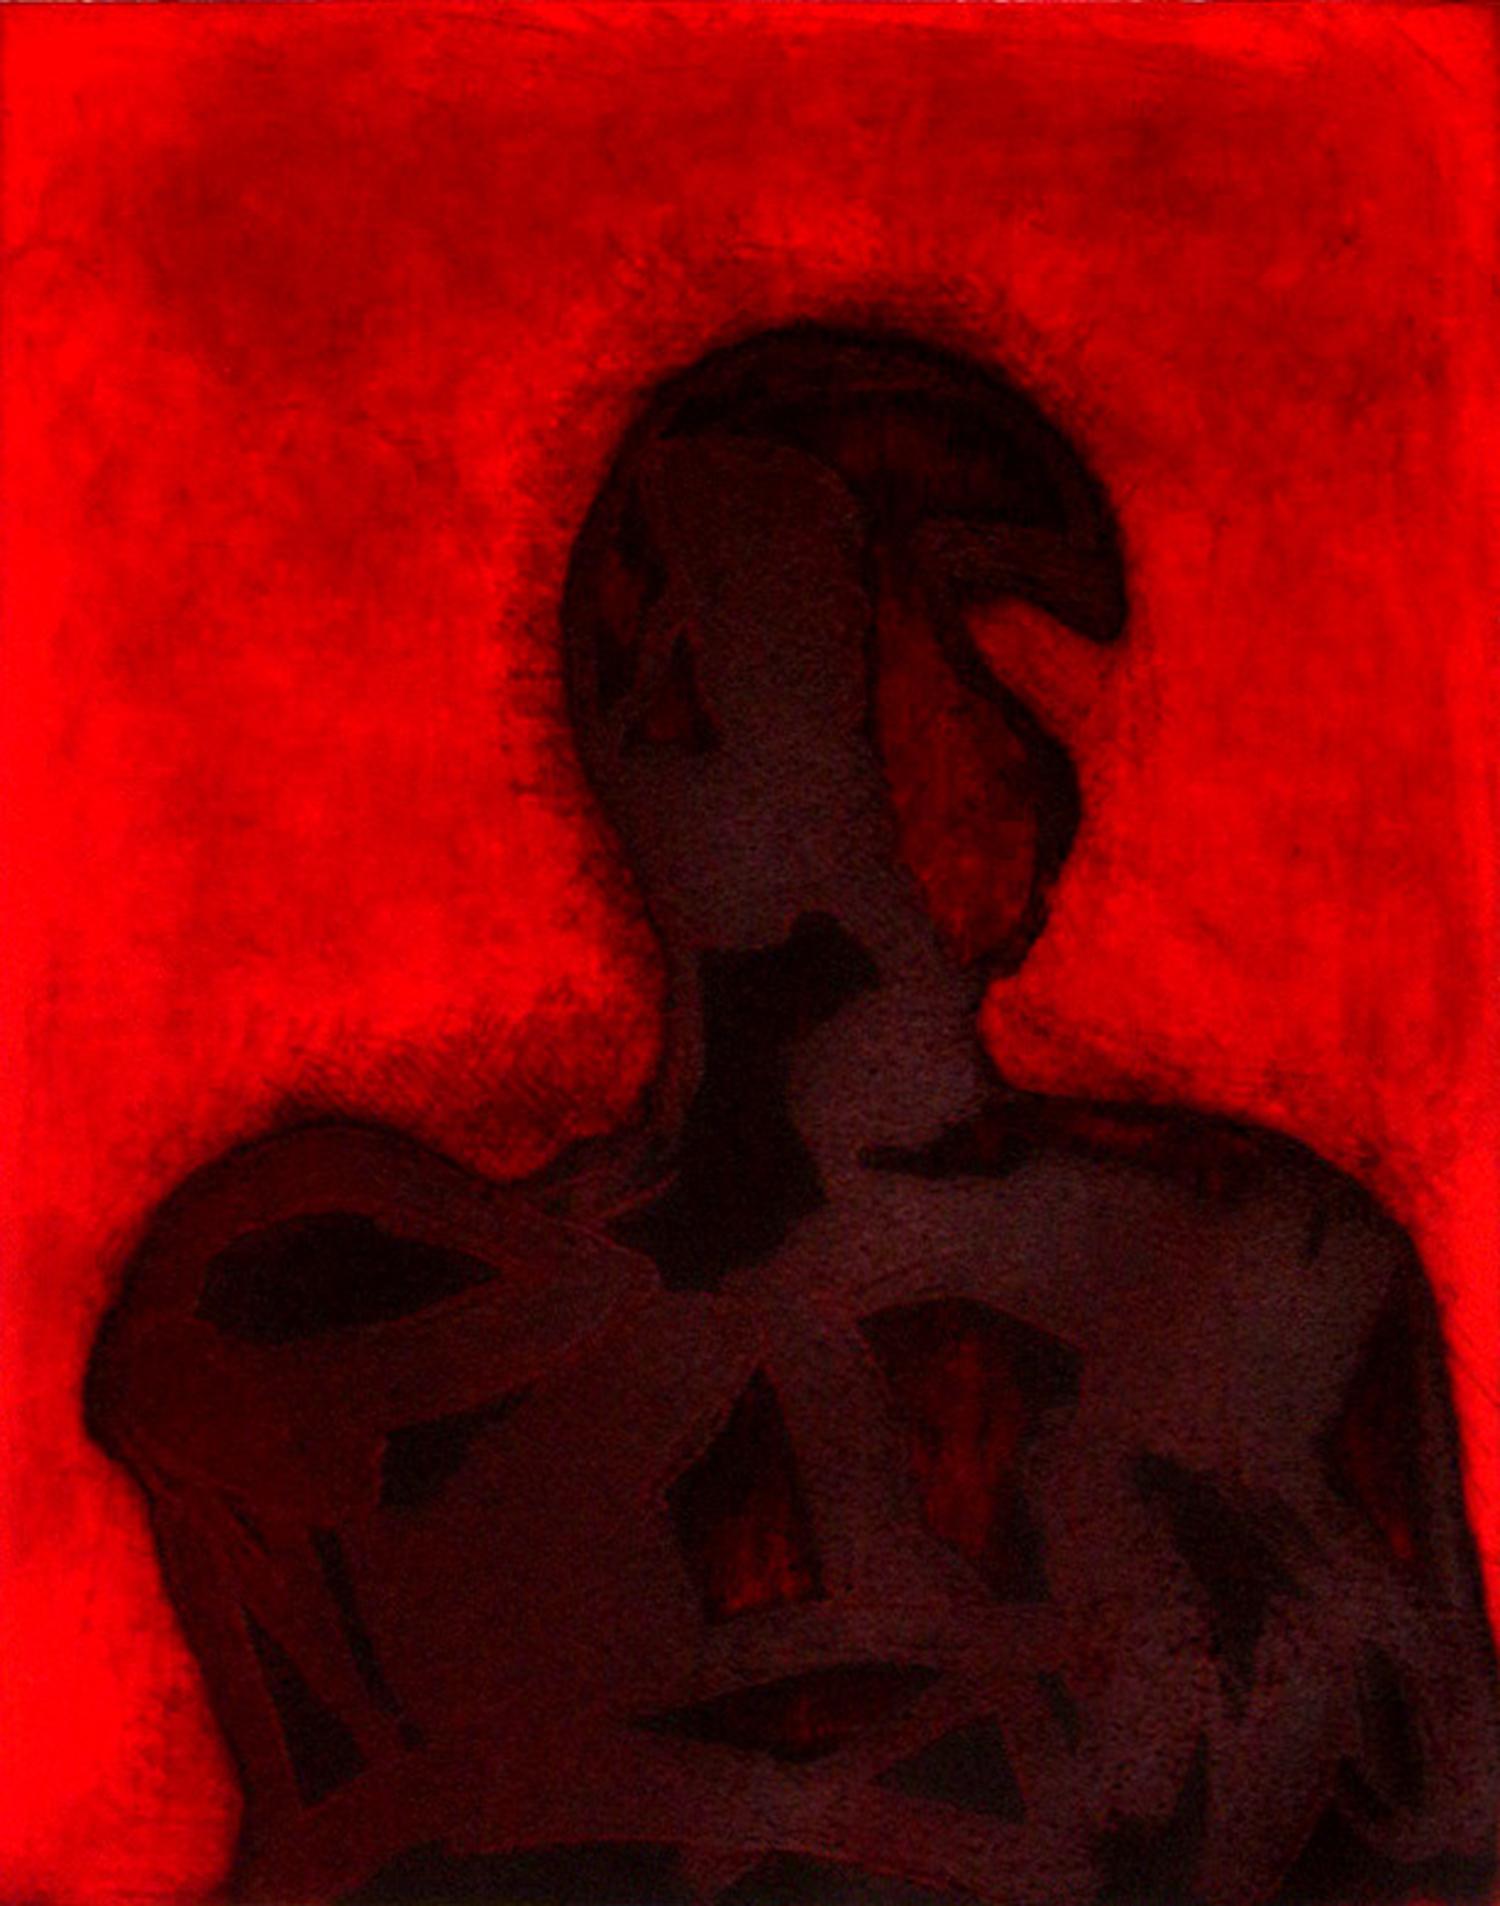 Peter Griffin, Red Carborundum    Date:  2007   Size (cm - unframed):  76 x 55   Technique:  Carborundum Etching & Screenprint   Materials:  Moulin Du Gue 300gsm   Edition size:  12   Publisher:  The Artist   Copyright:  The Artist    P.O.A.